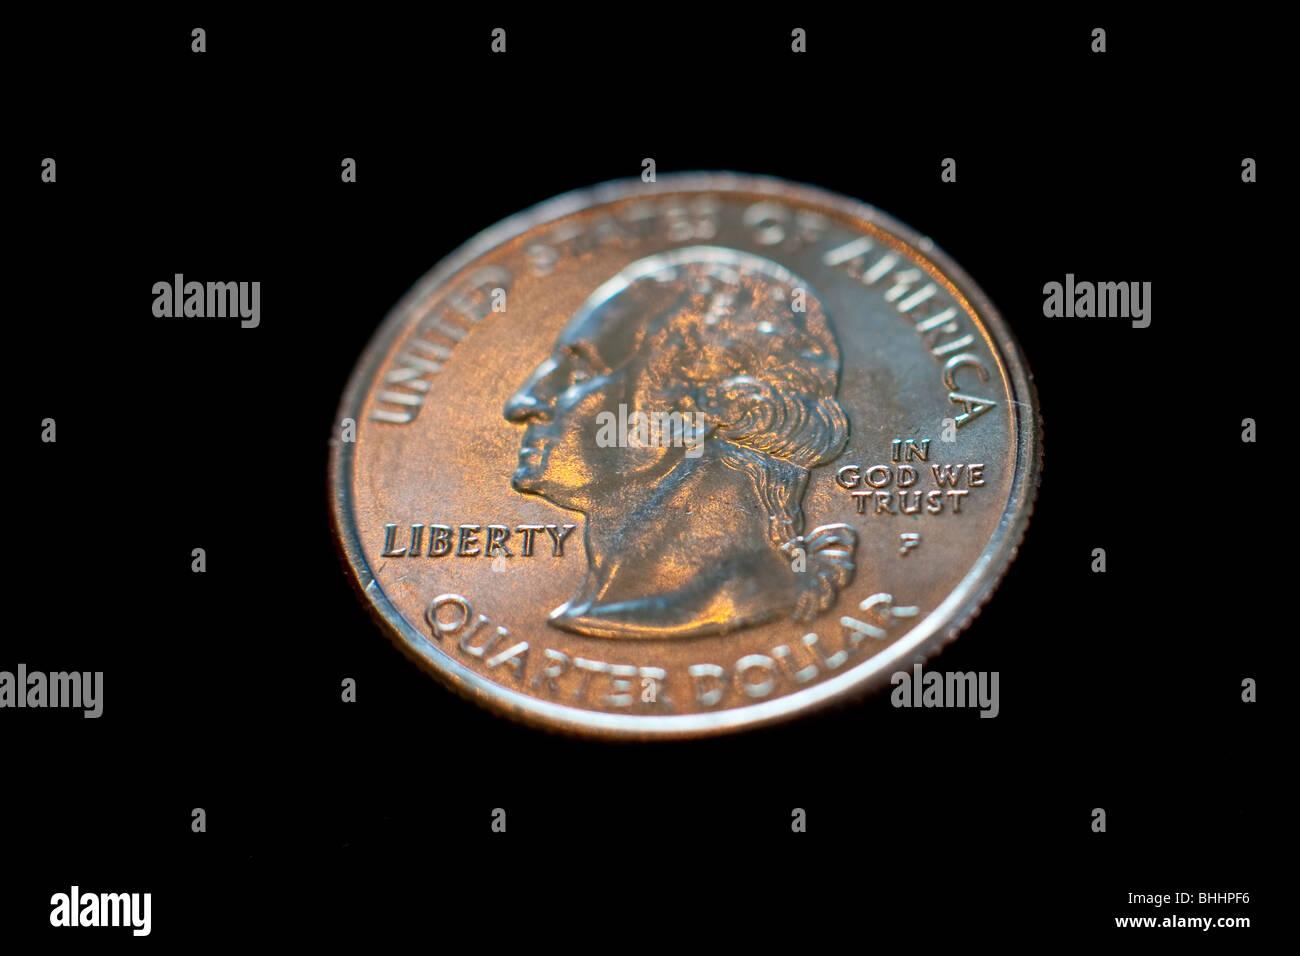 US quarter dollar coin - Stock Image